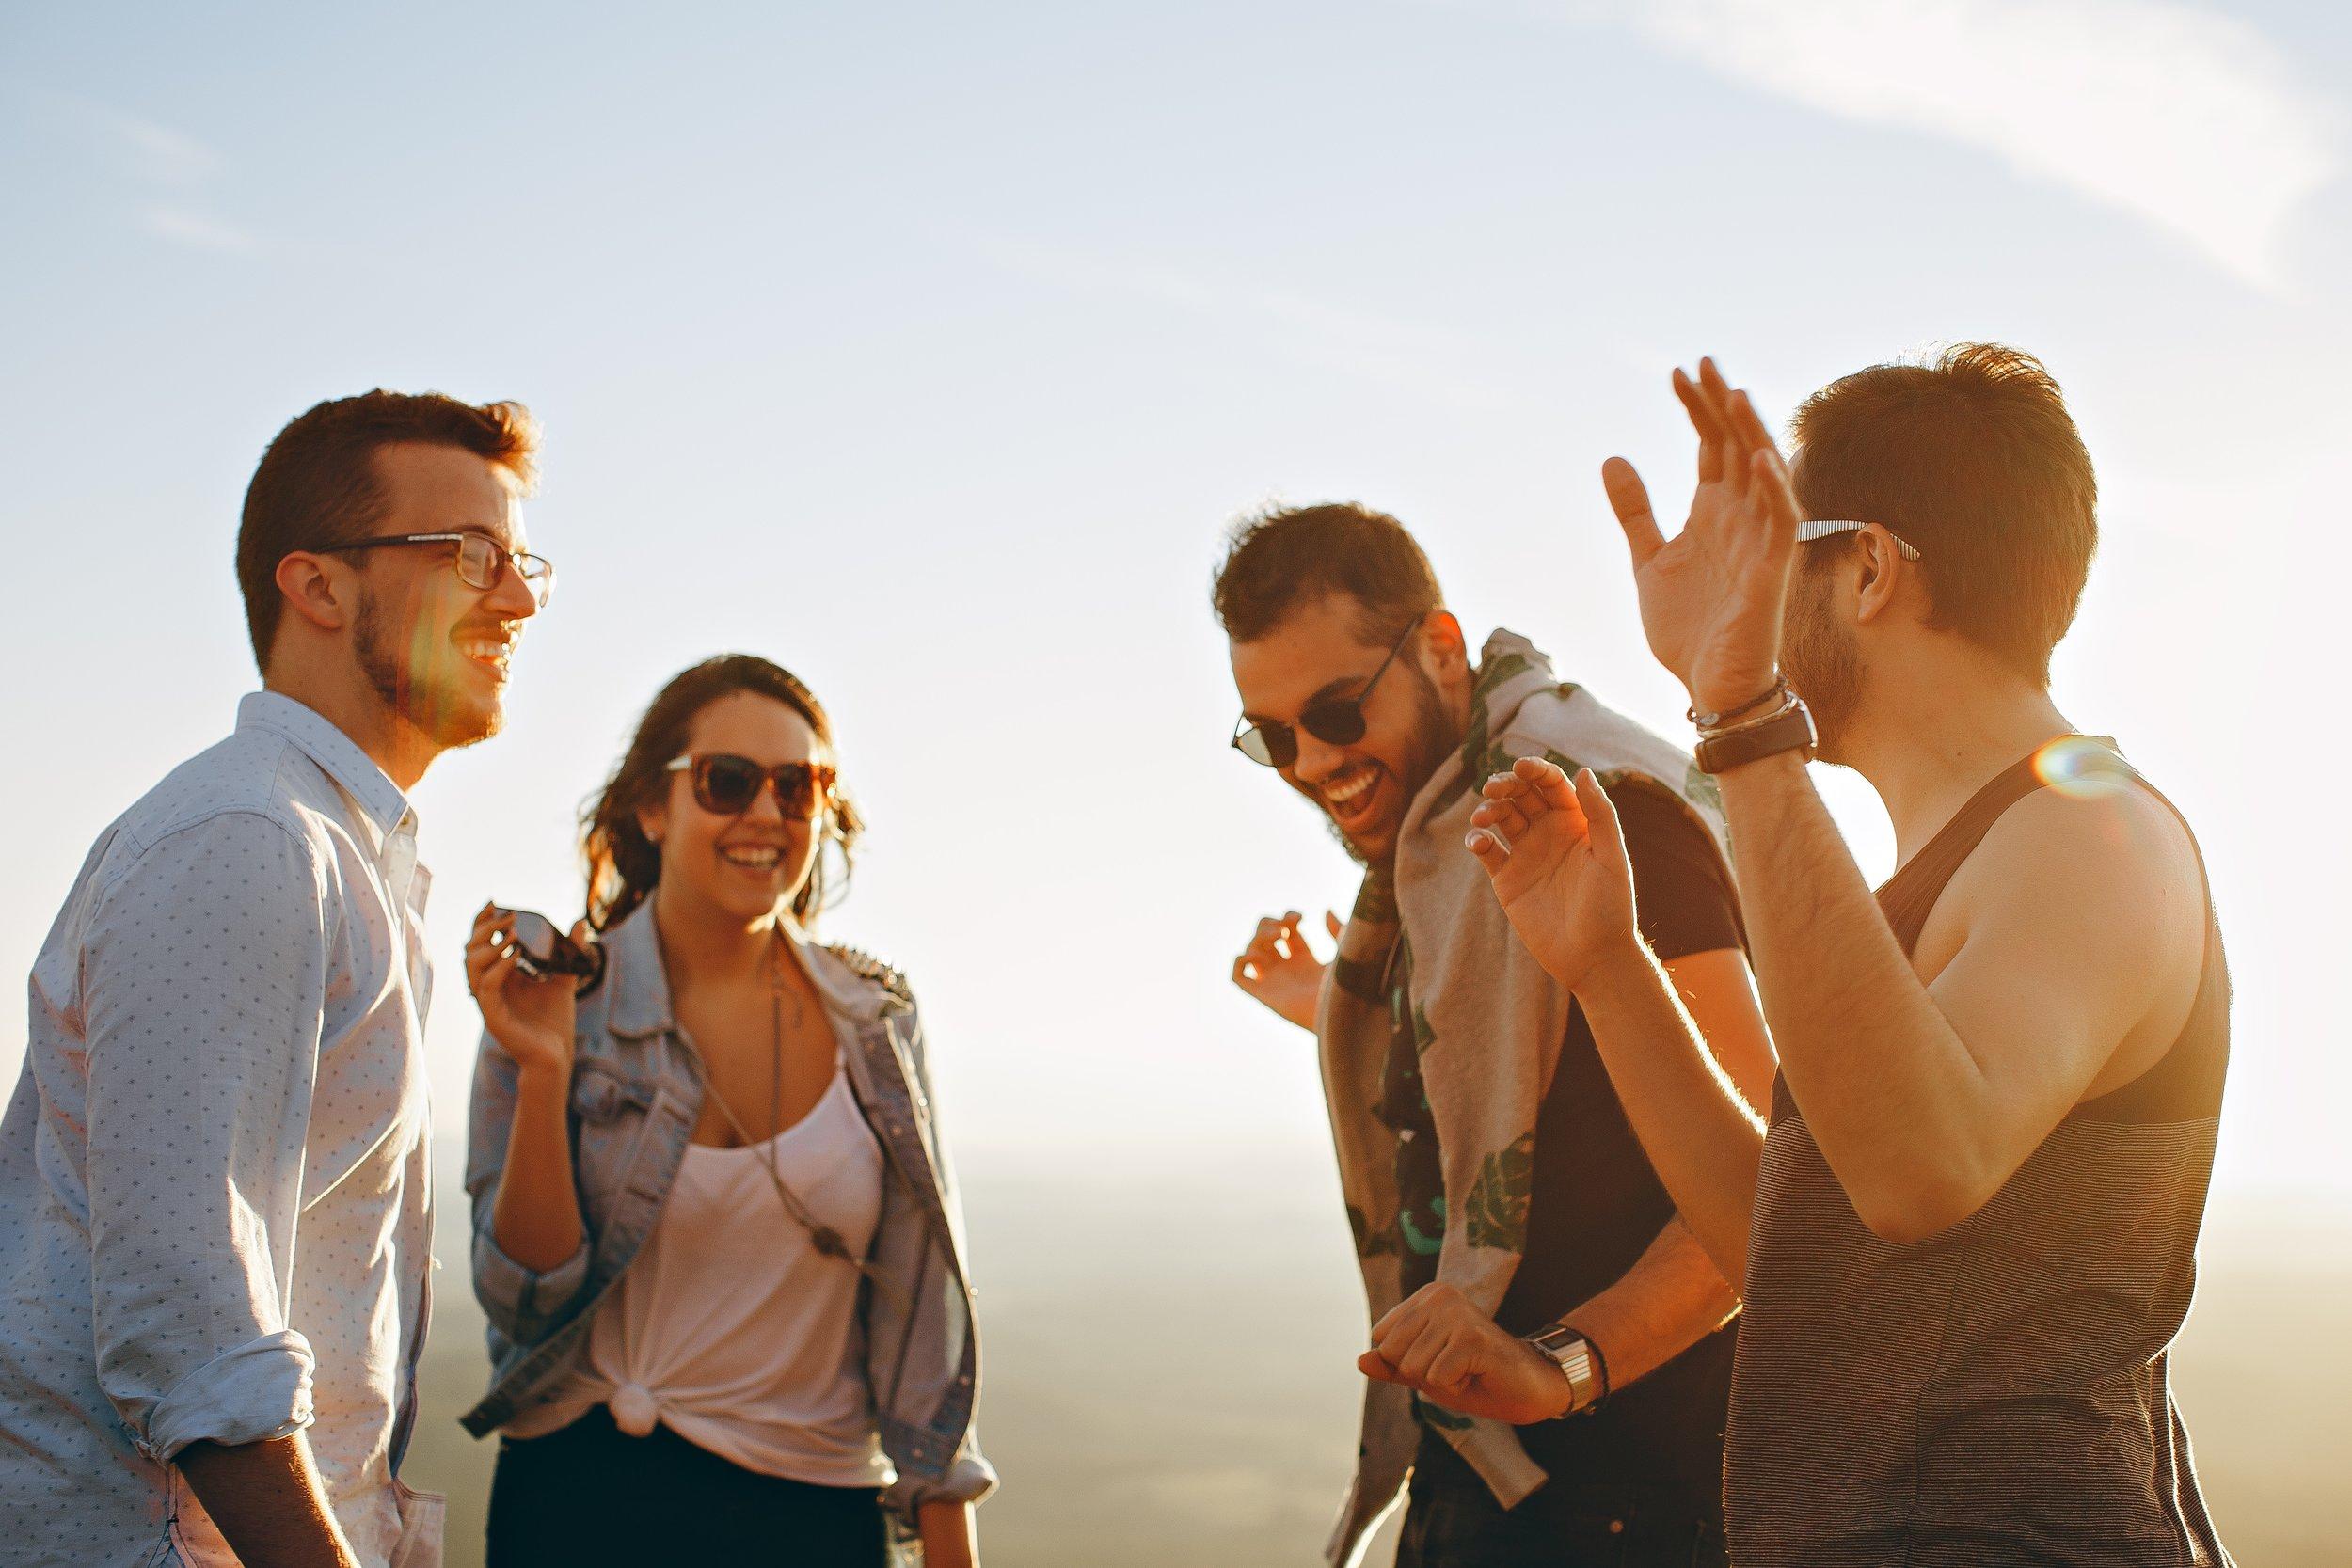 Just how happy is Australia, exactly?      Eternity News   4 April, 2019  Author: Dr Kirsten Birkett, 2018 ADM Senior Research Fellow